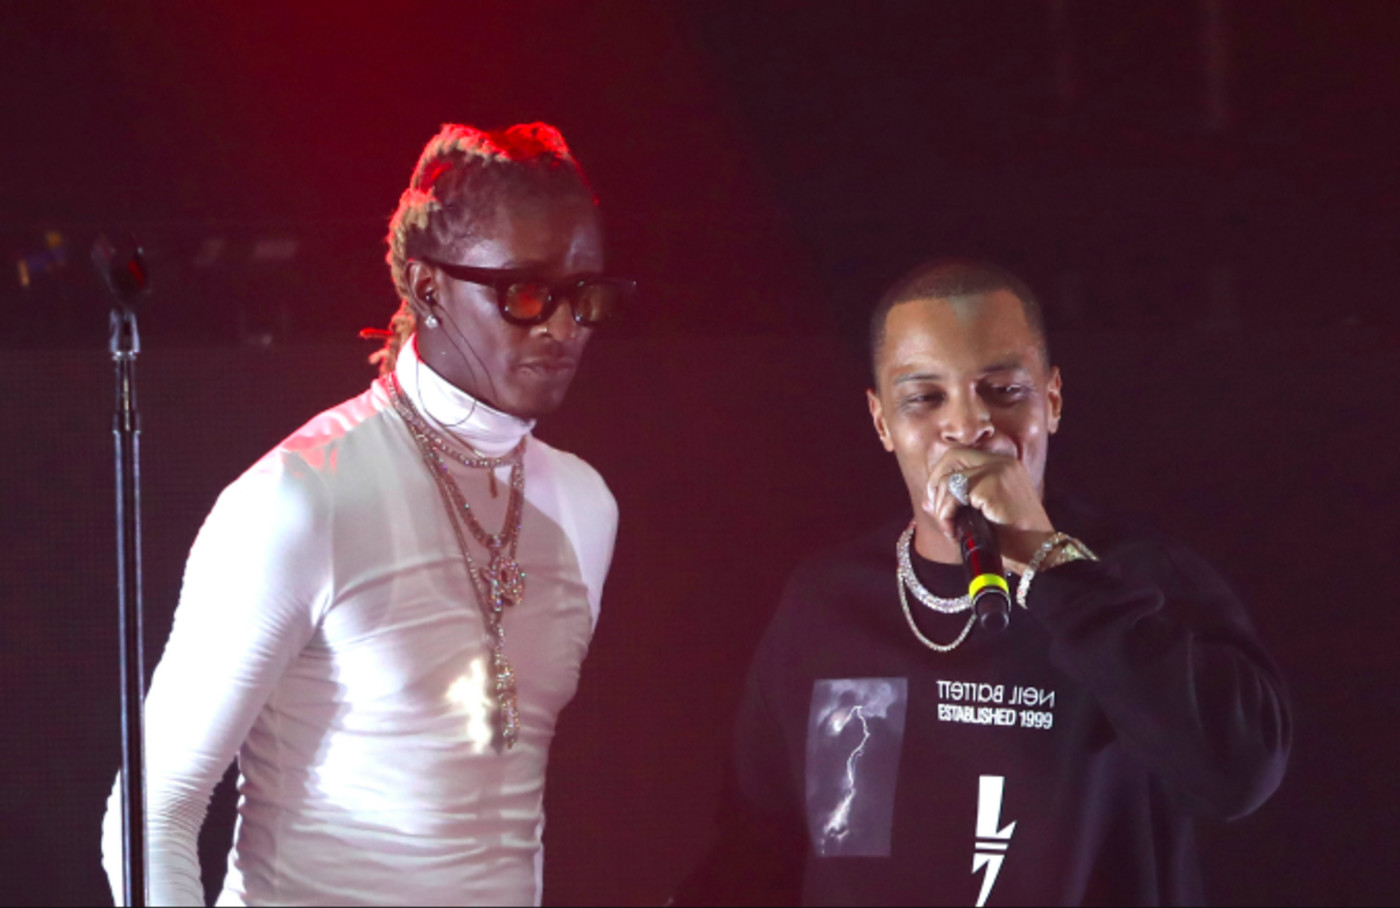 Young Thug and T.I. peform at Hollywood Palladium